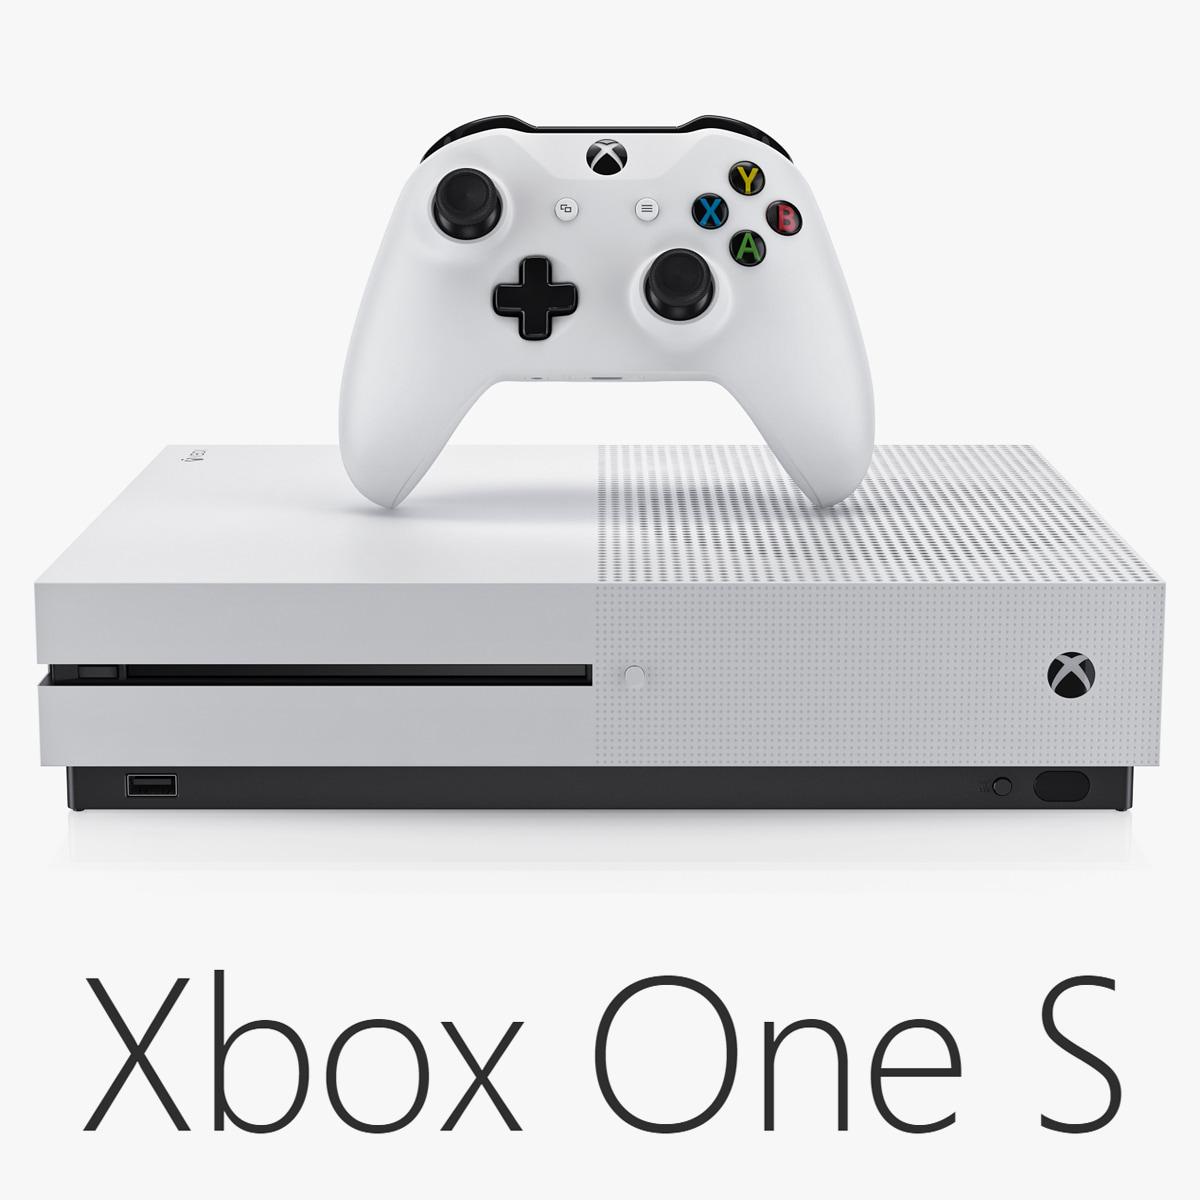 Xbox_One_S_Console_00.jpg